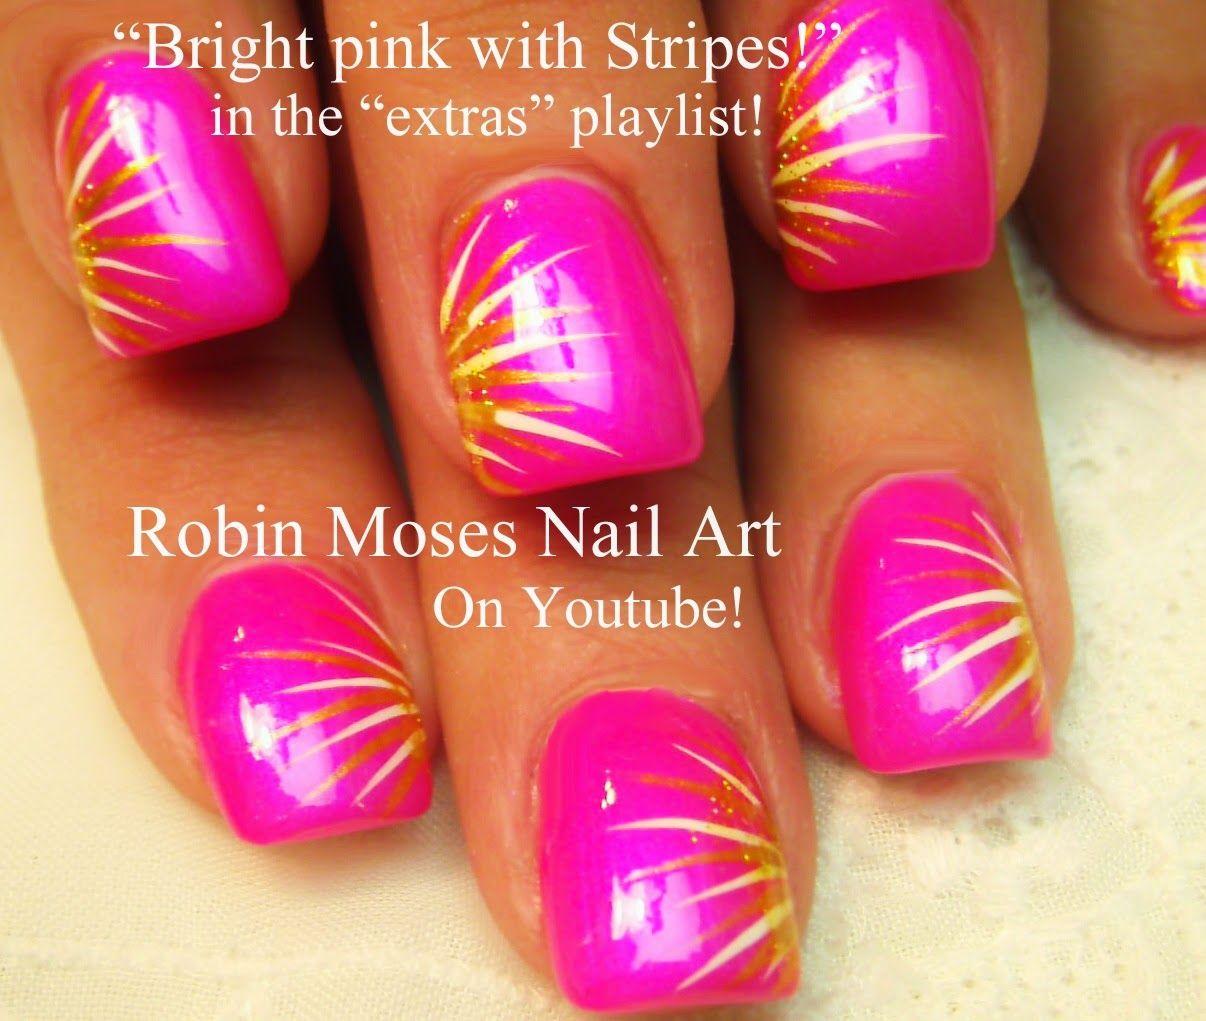 Robin Moses Nail Art: February 2015 | Nails | Pinterest | Robin ...